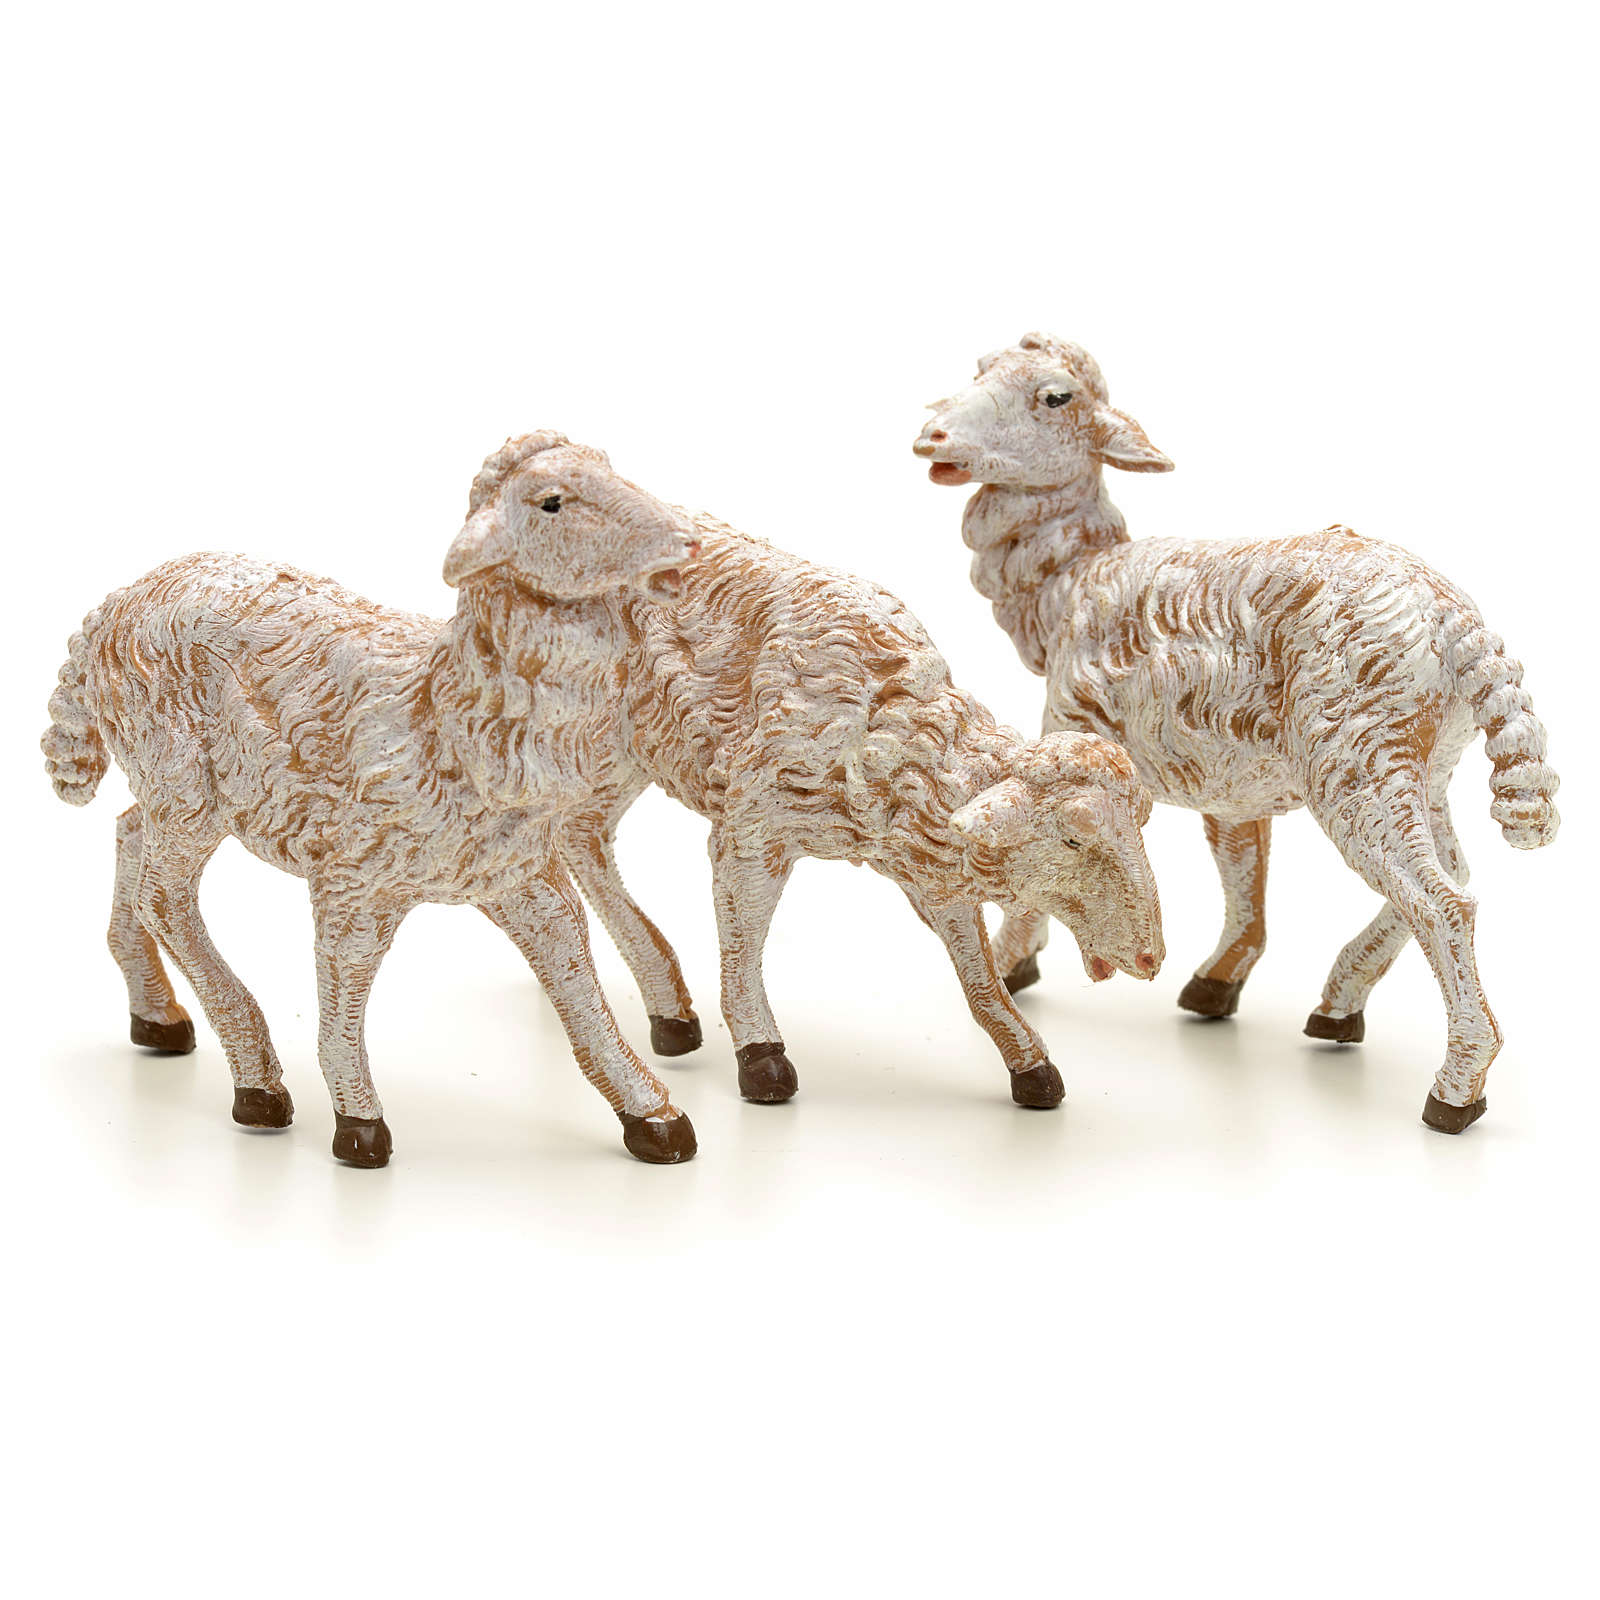 Schafe Krippe 19 cm Fontanini 3 Stücke 4